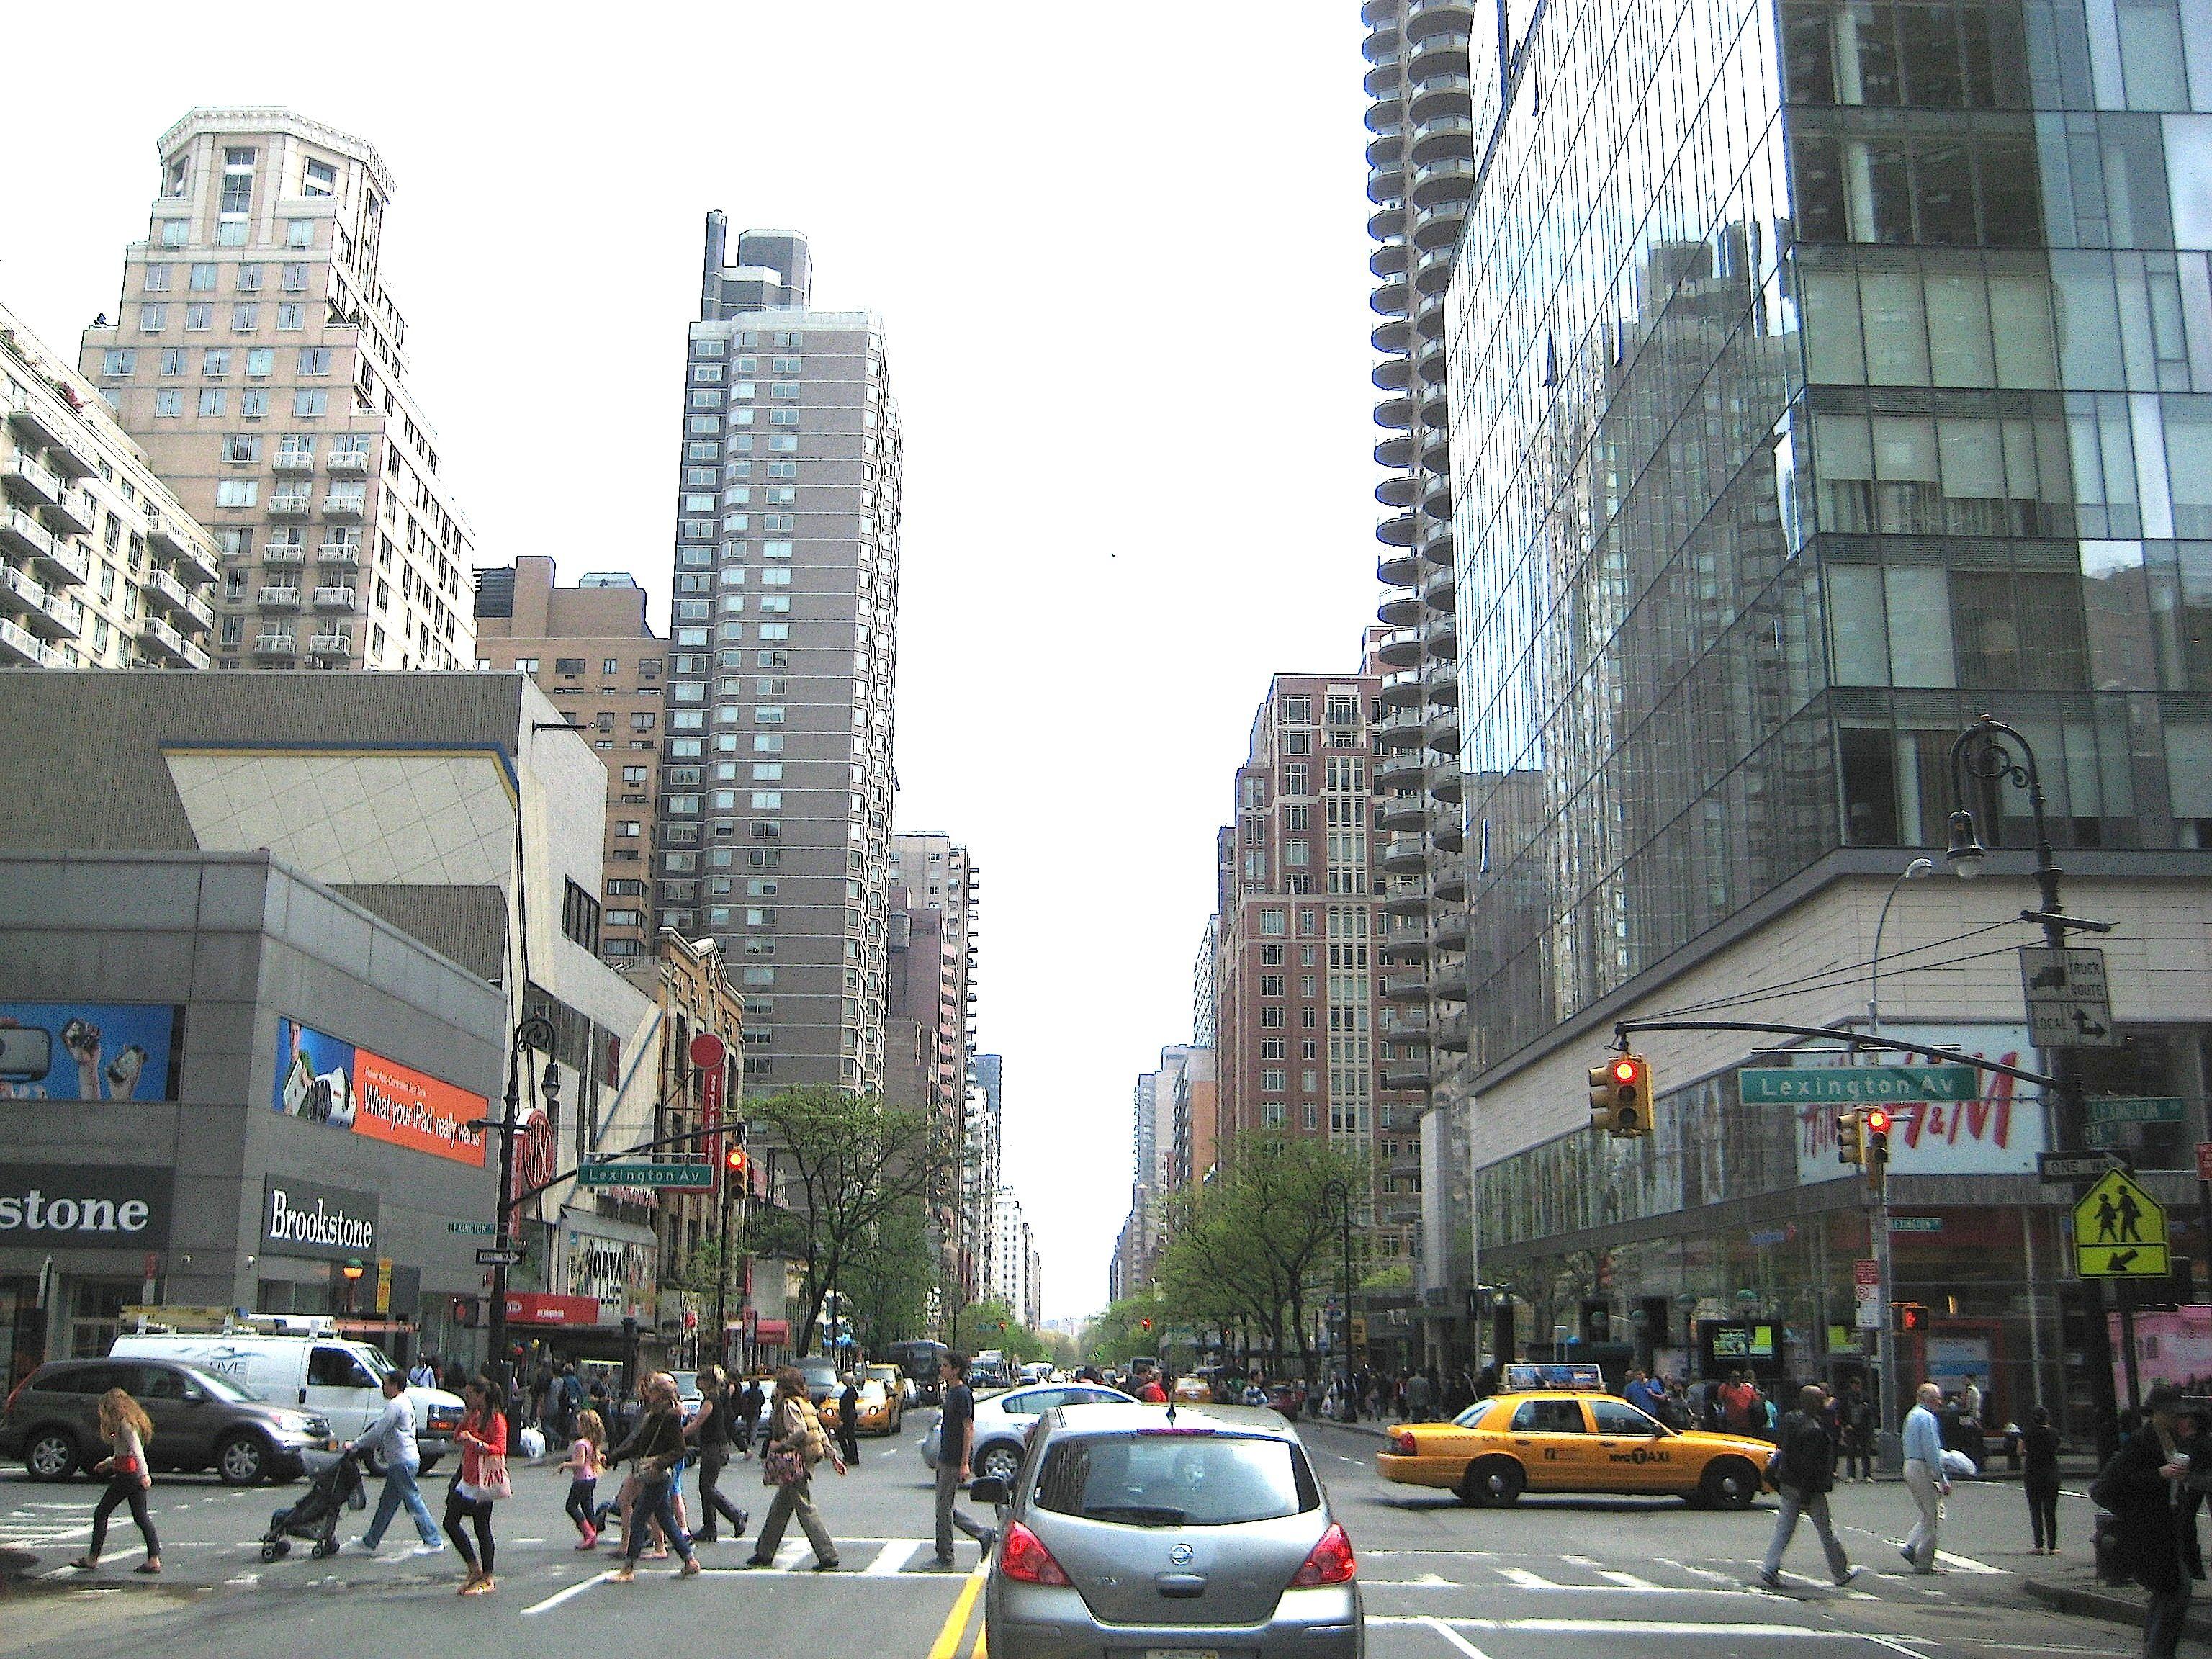 Lexington Avenue & 86Th Street (Upper East Side Section Of